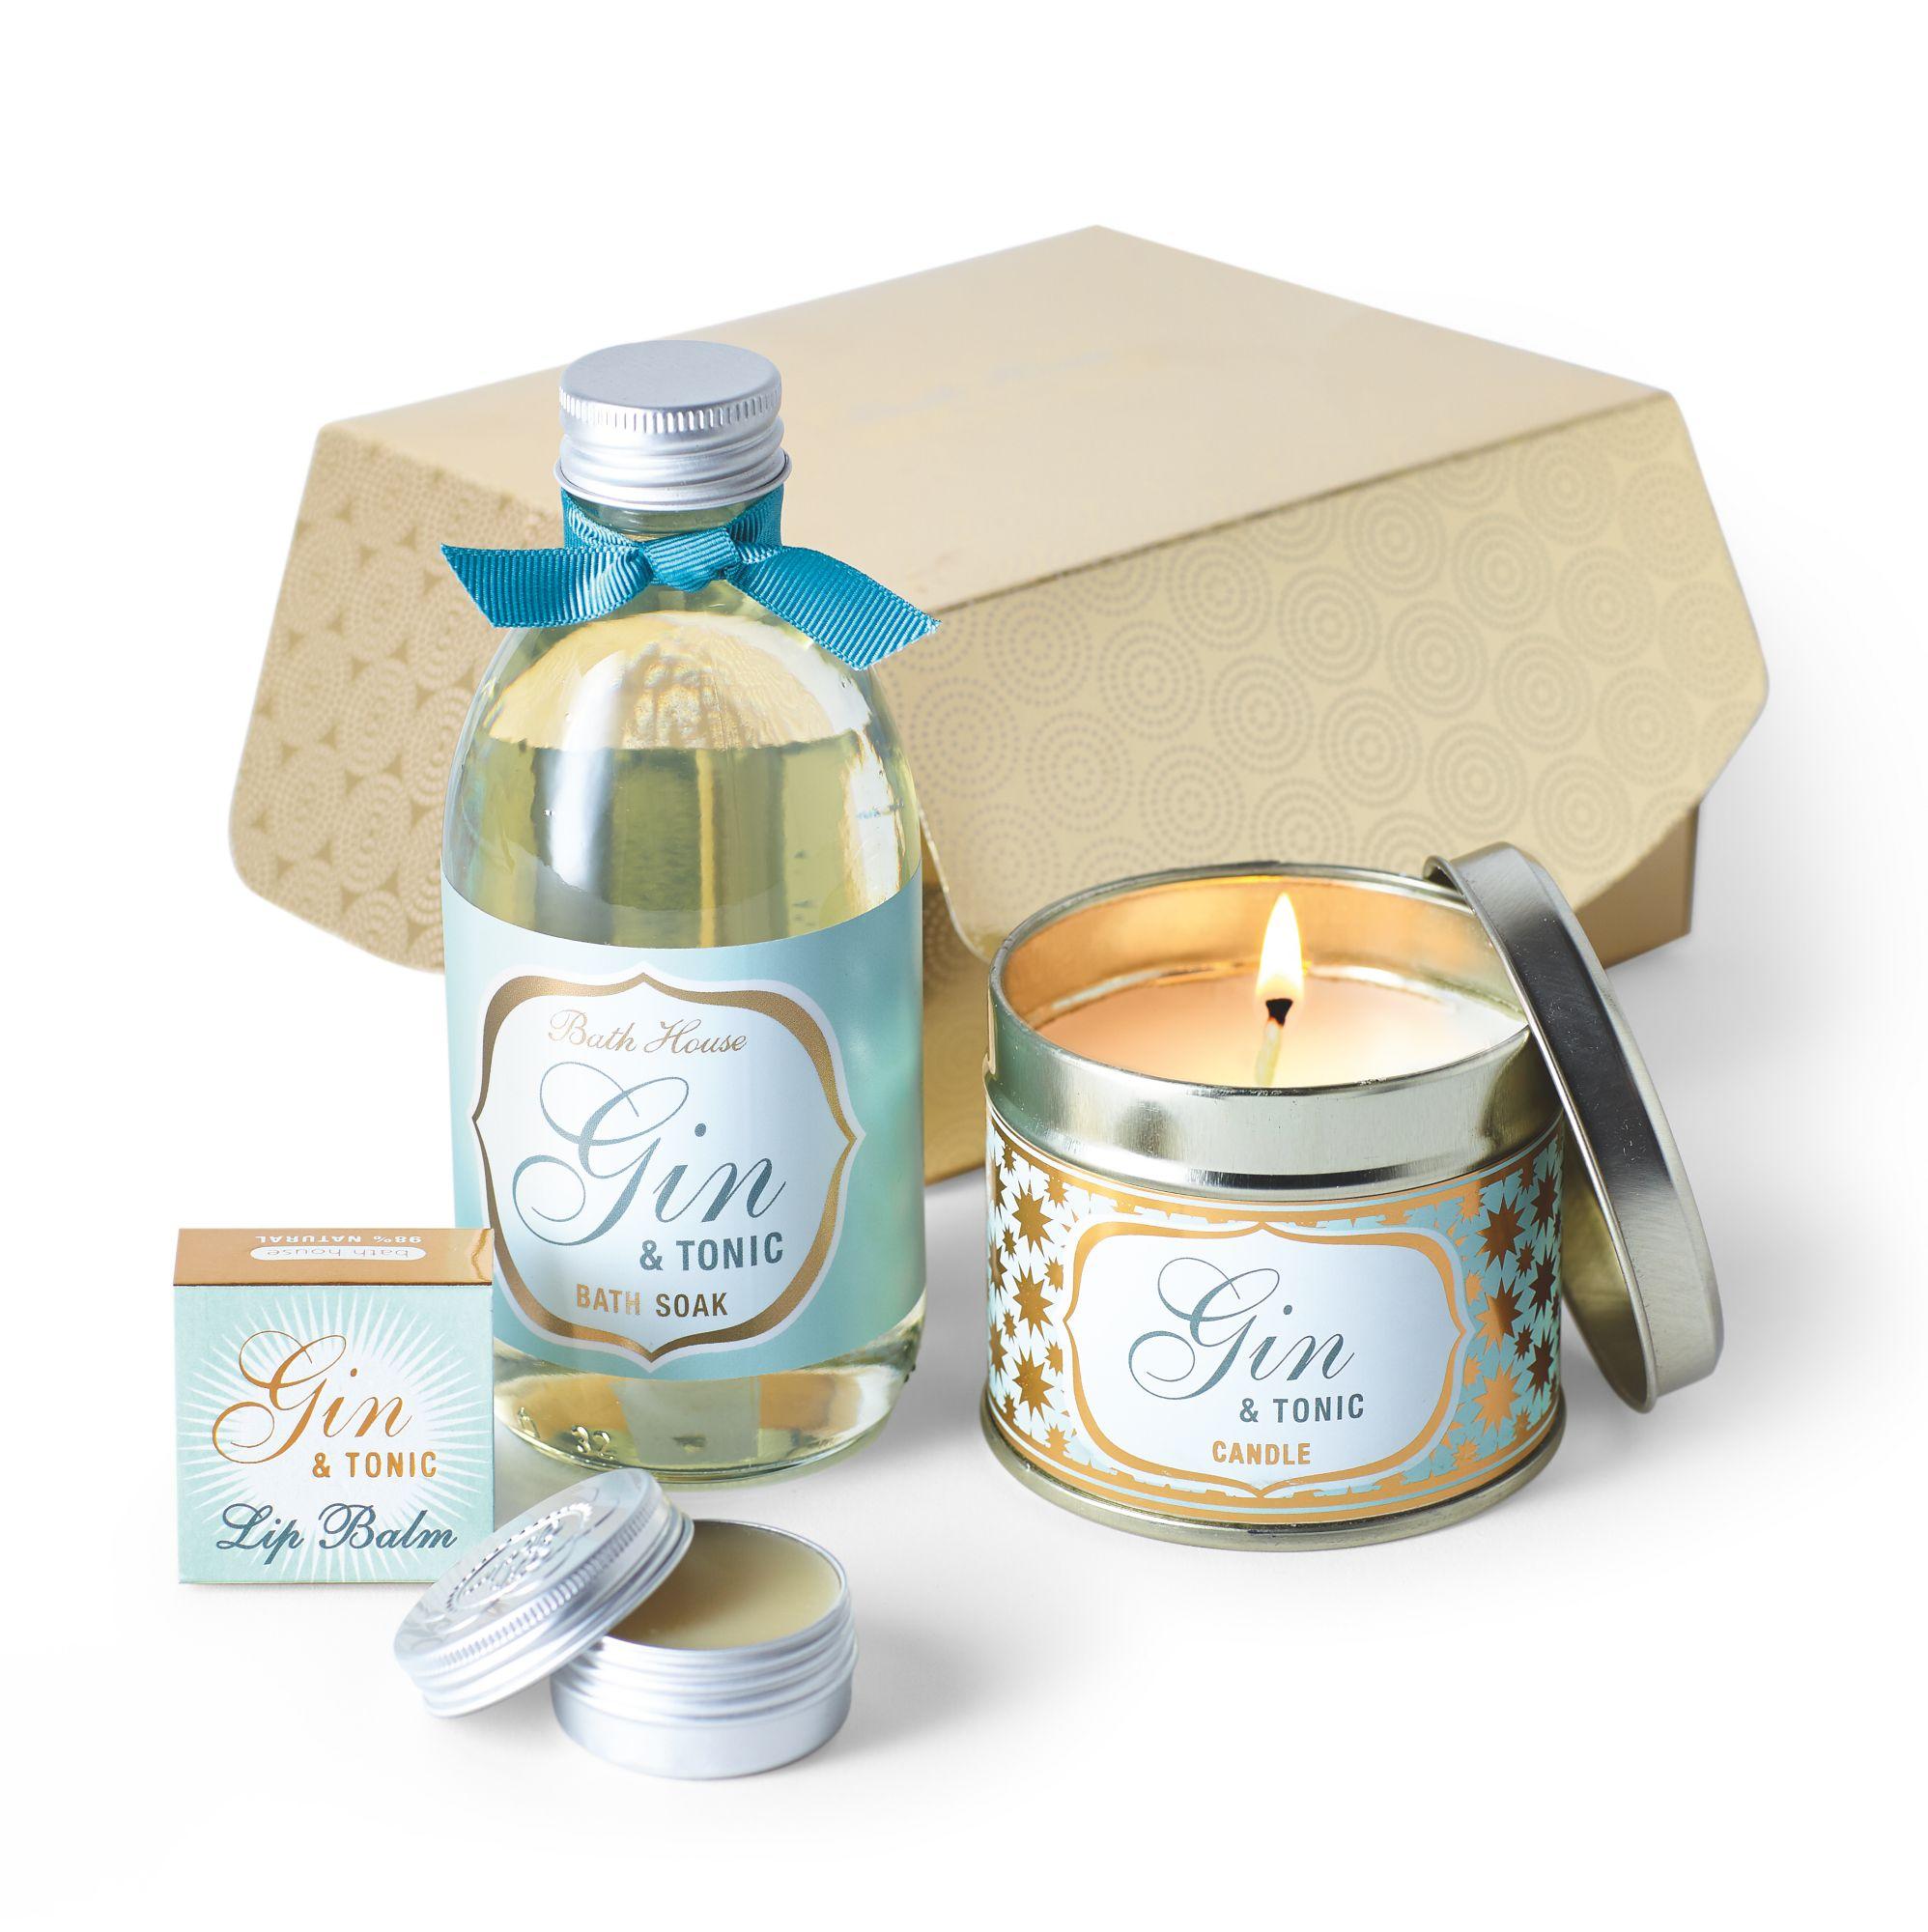 Image of Bath House Gin & Tonic Temptation Gift Box